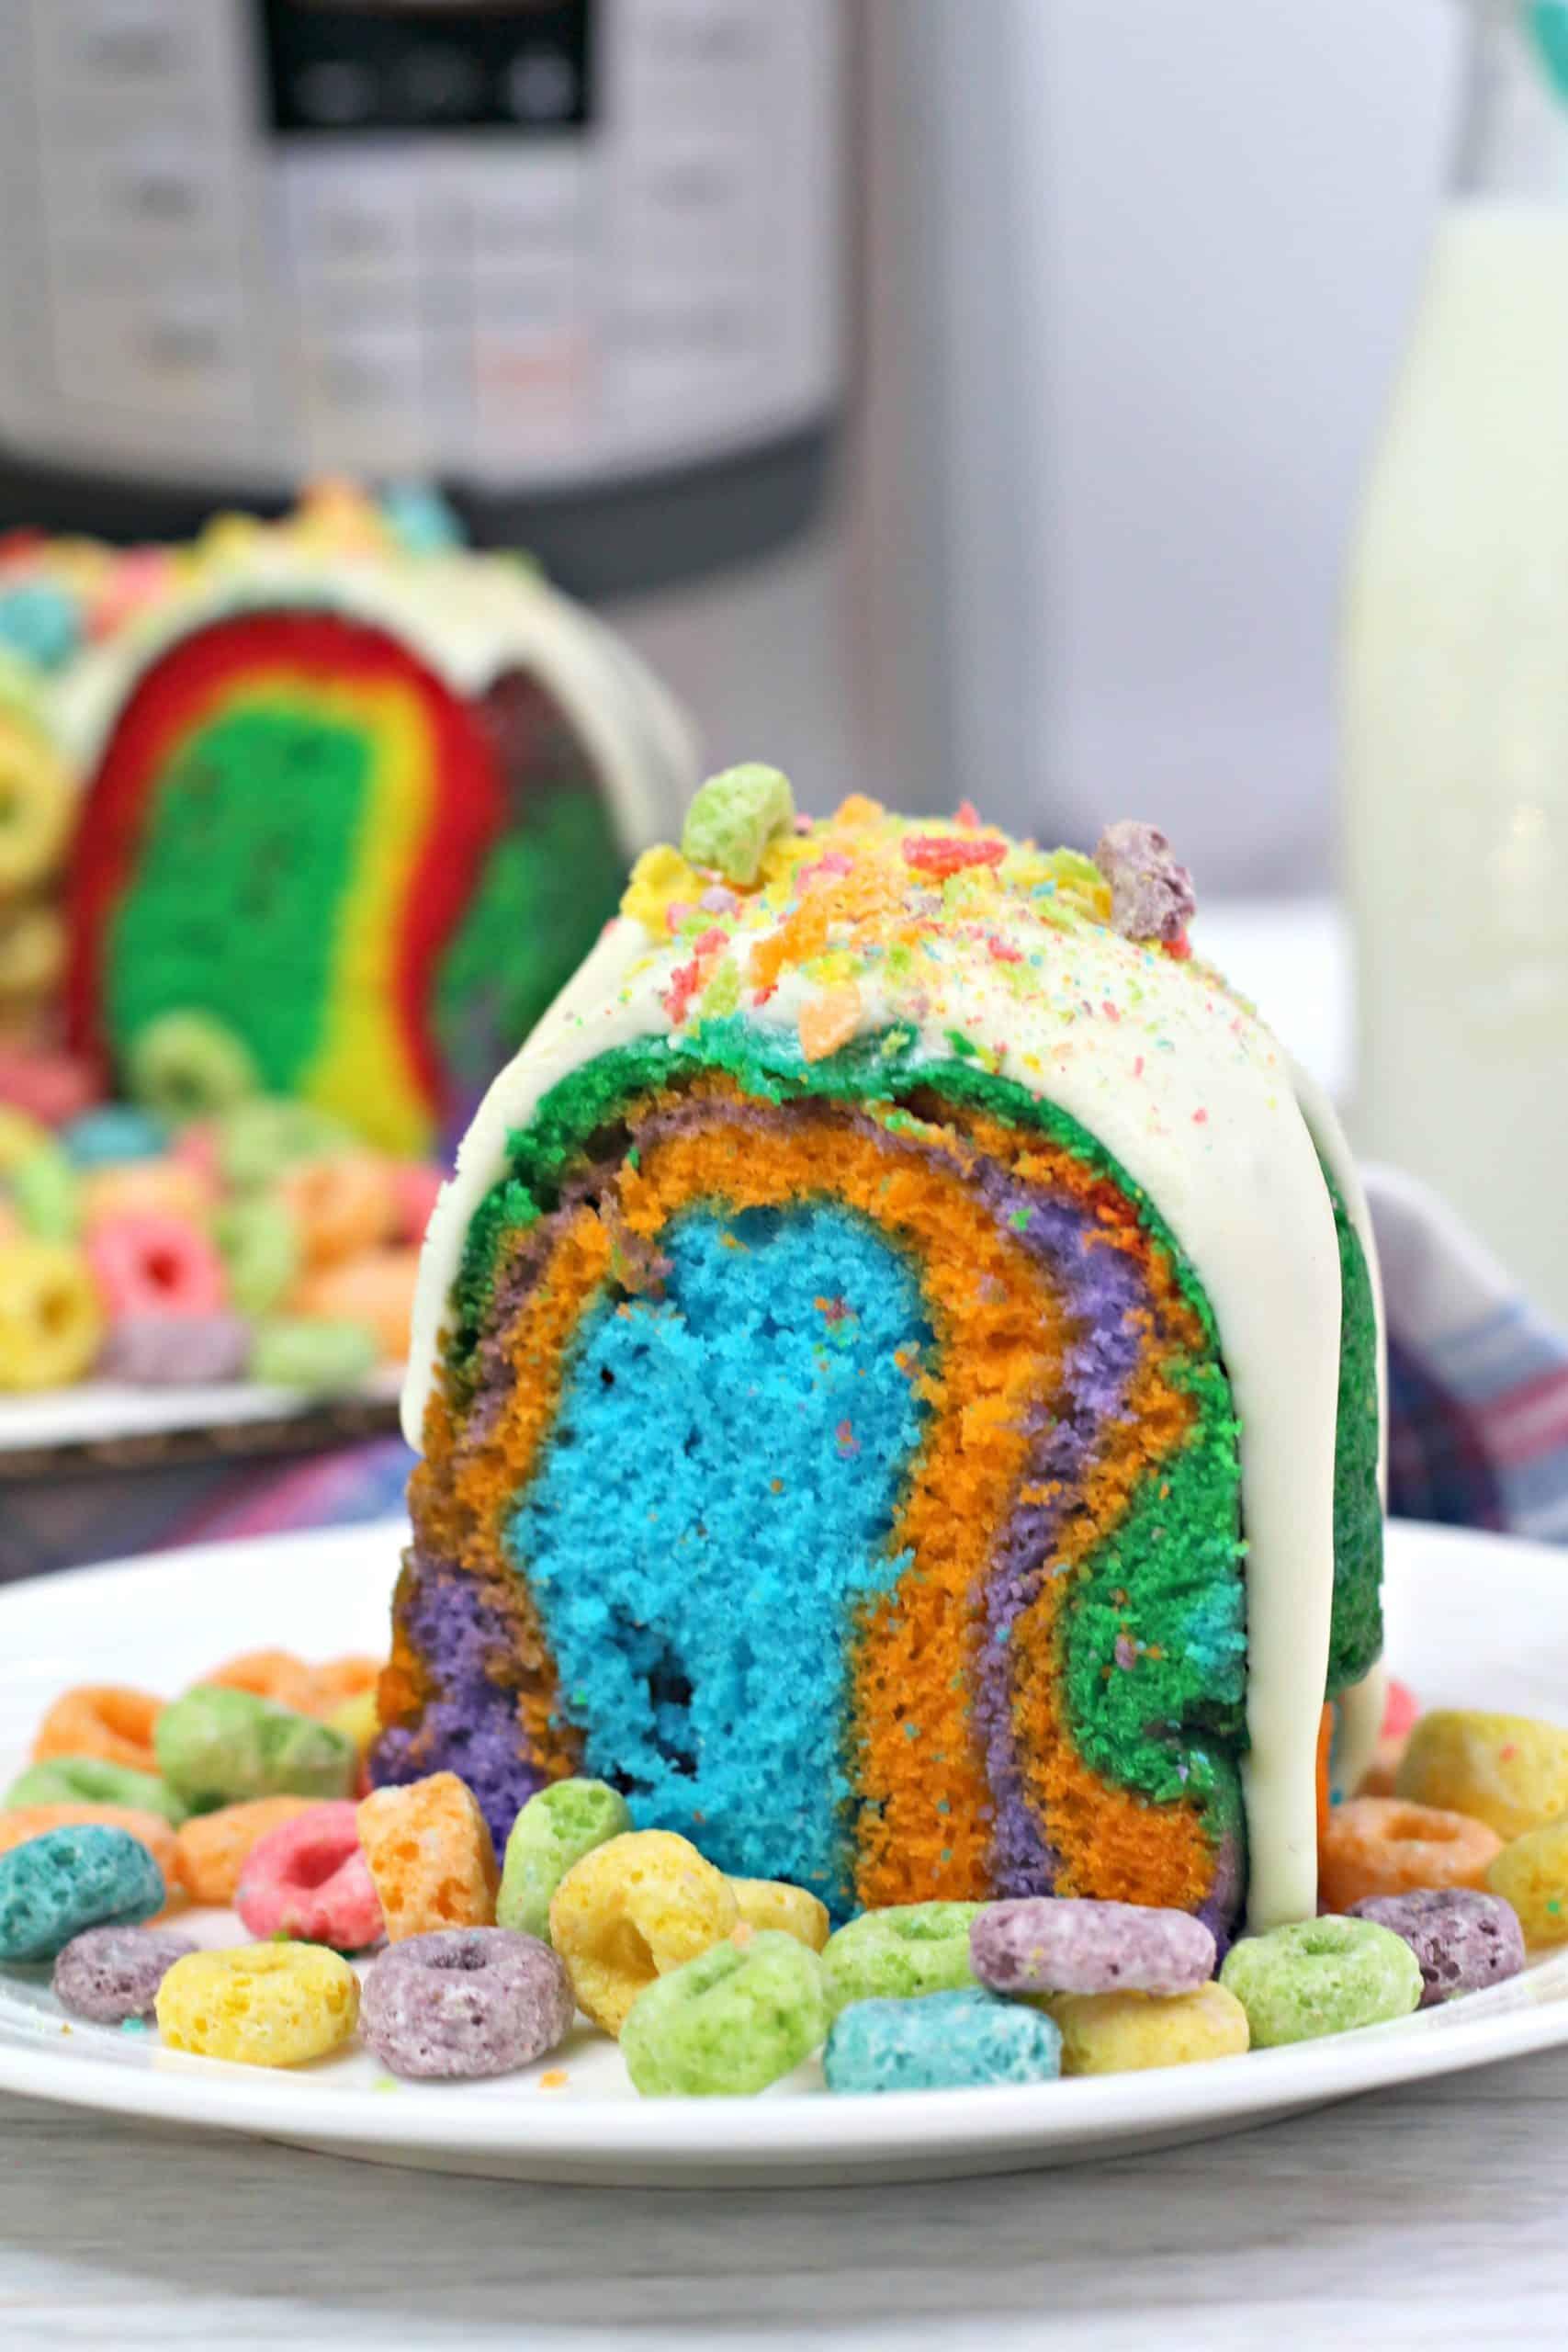 Stunning Instant Pot Fruit Loops Rainbow Bundt Cake